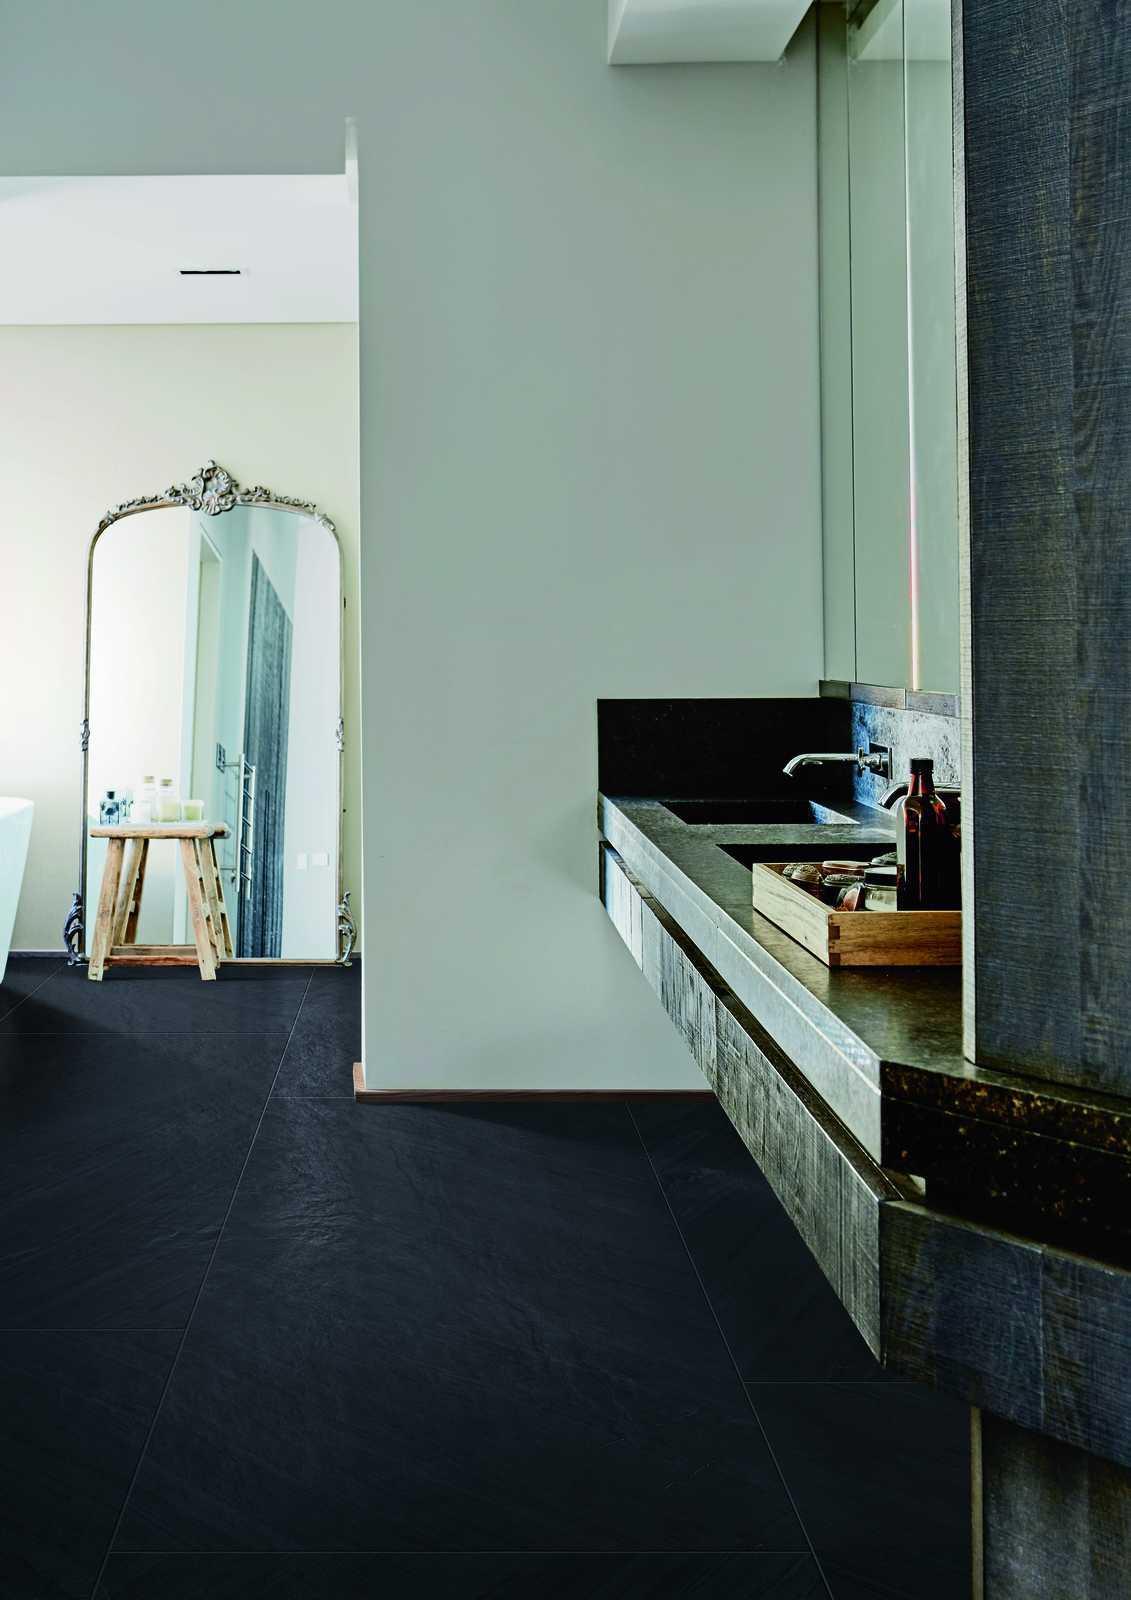 faience salle de bain imitation pierre.html